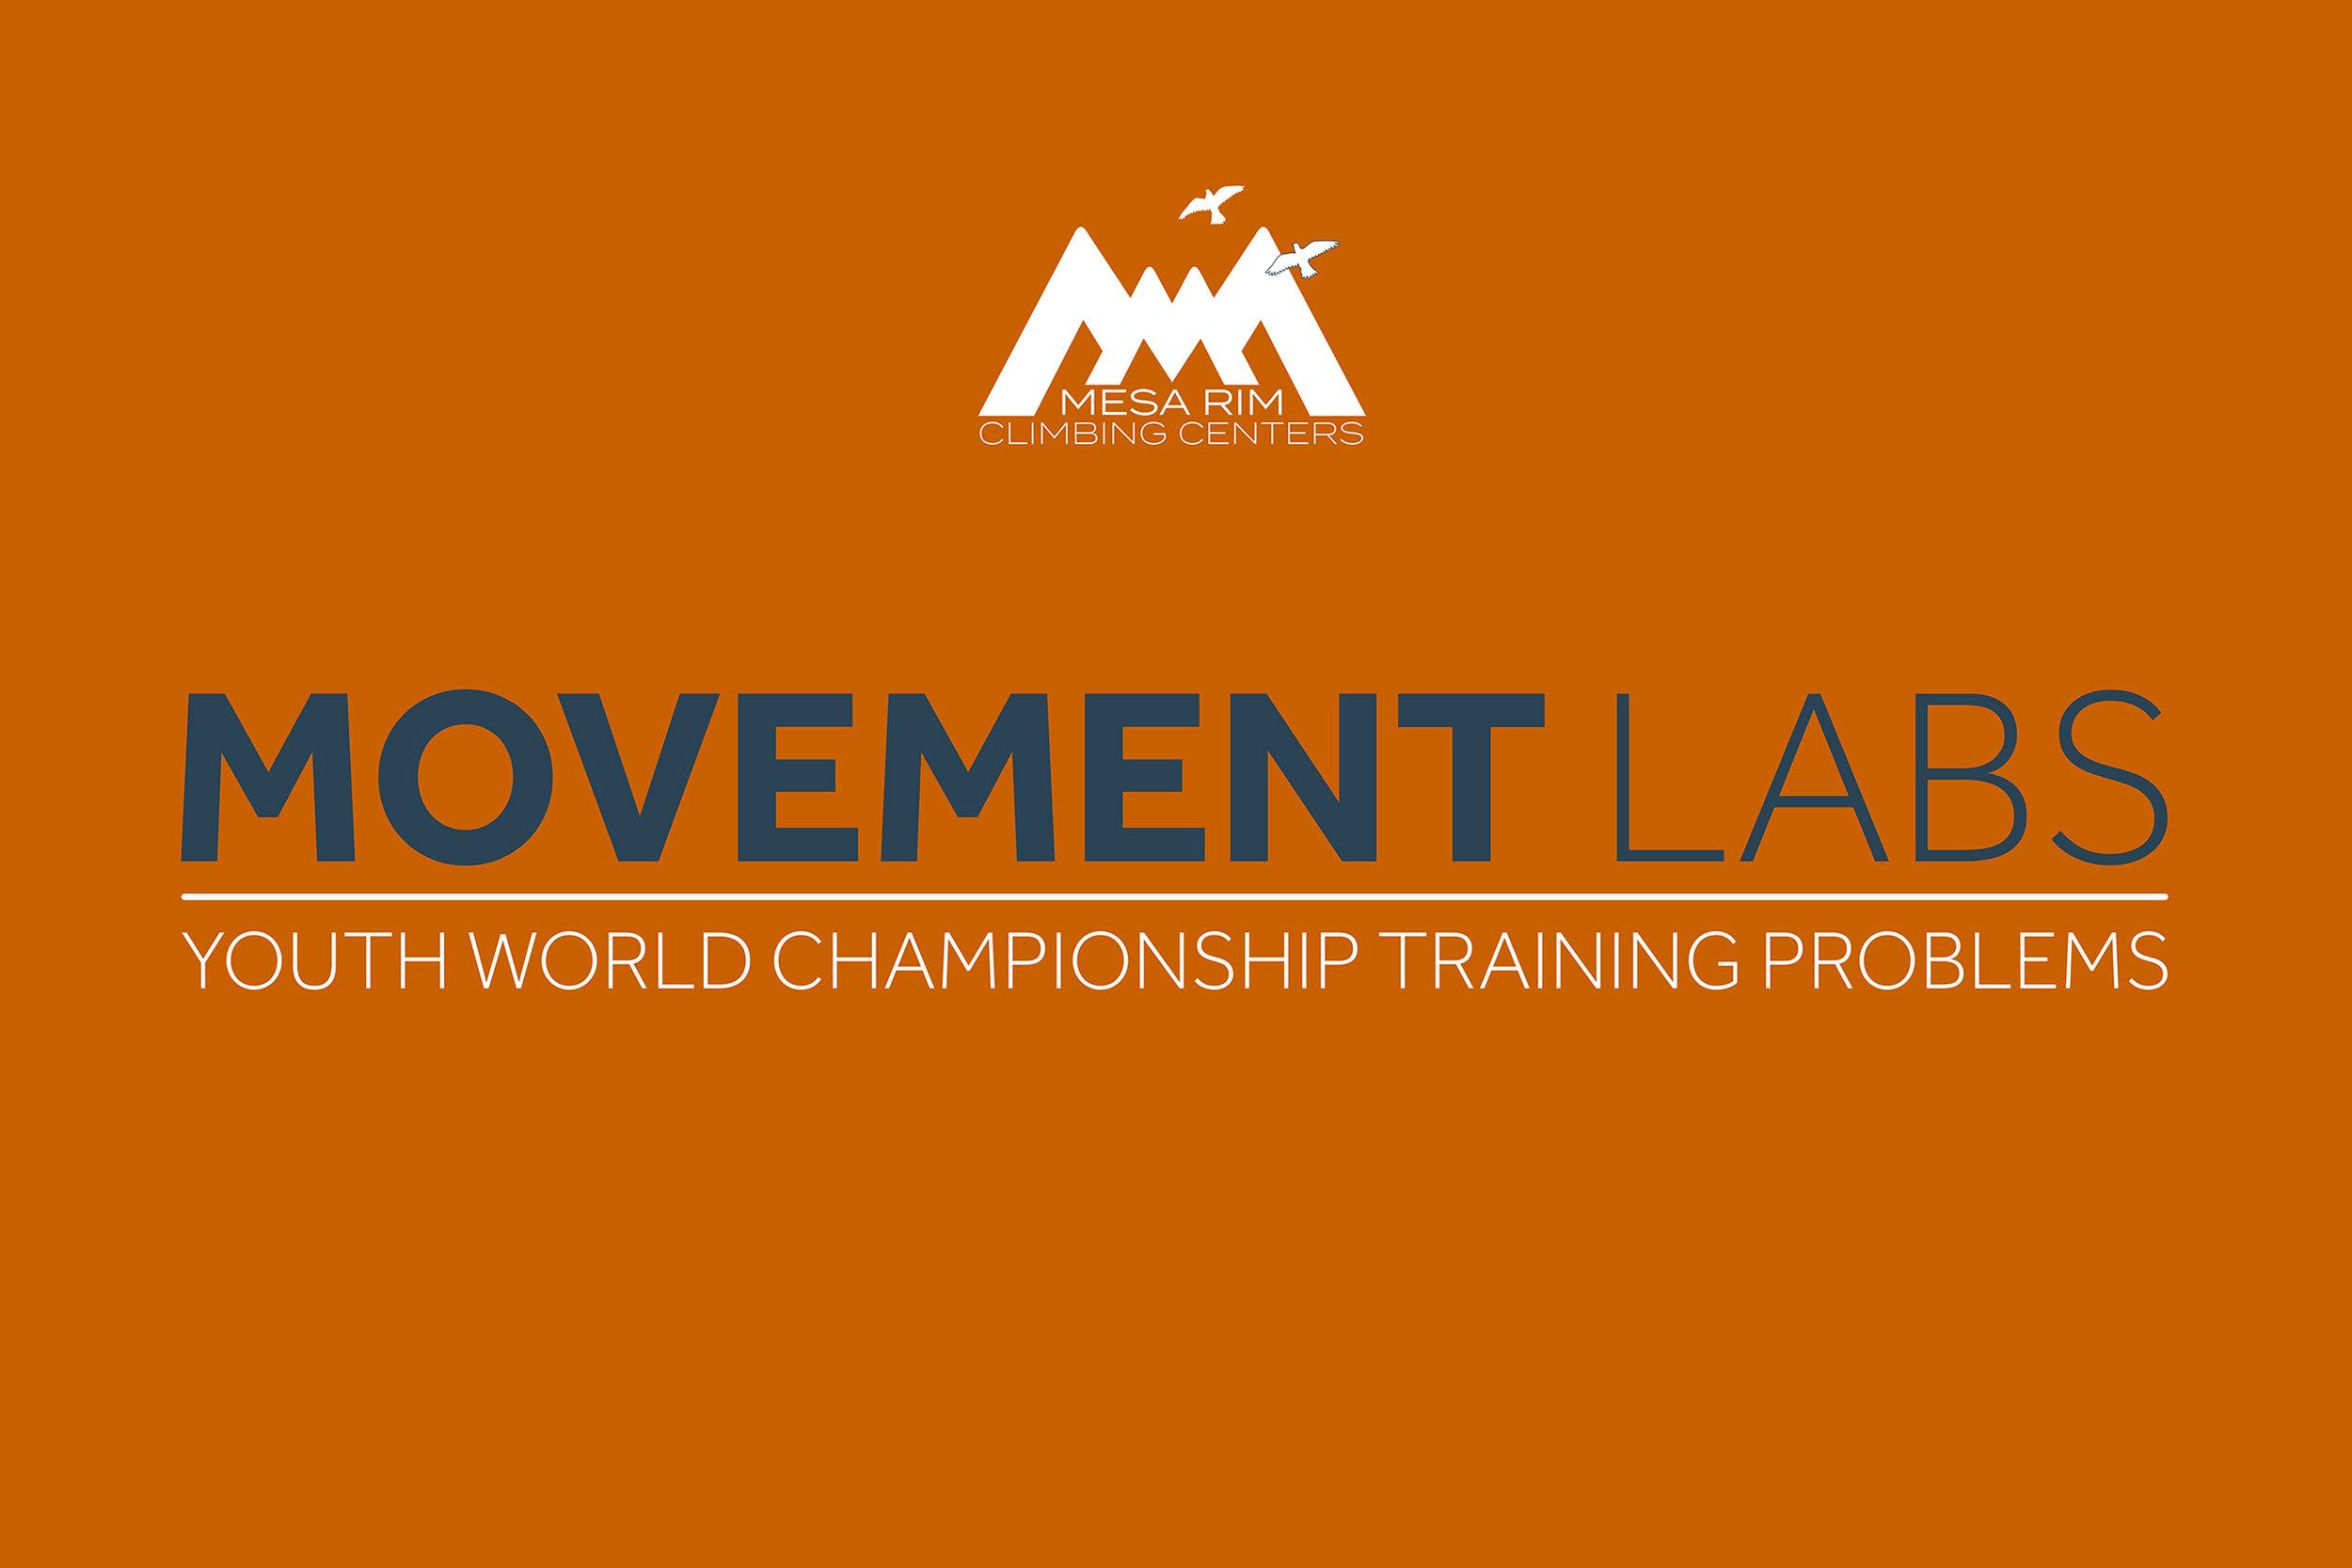 Movement Lab.jpg